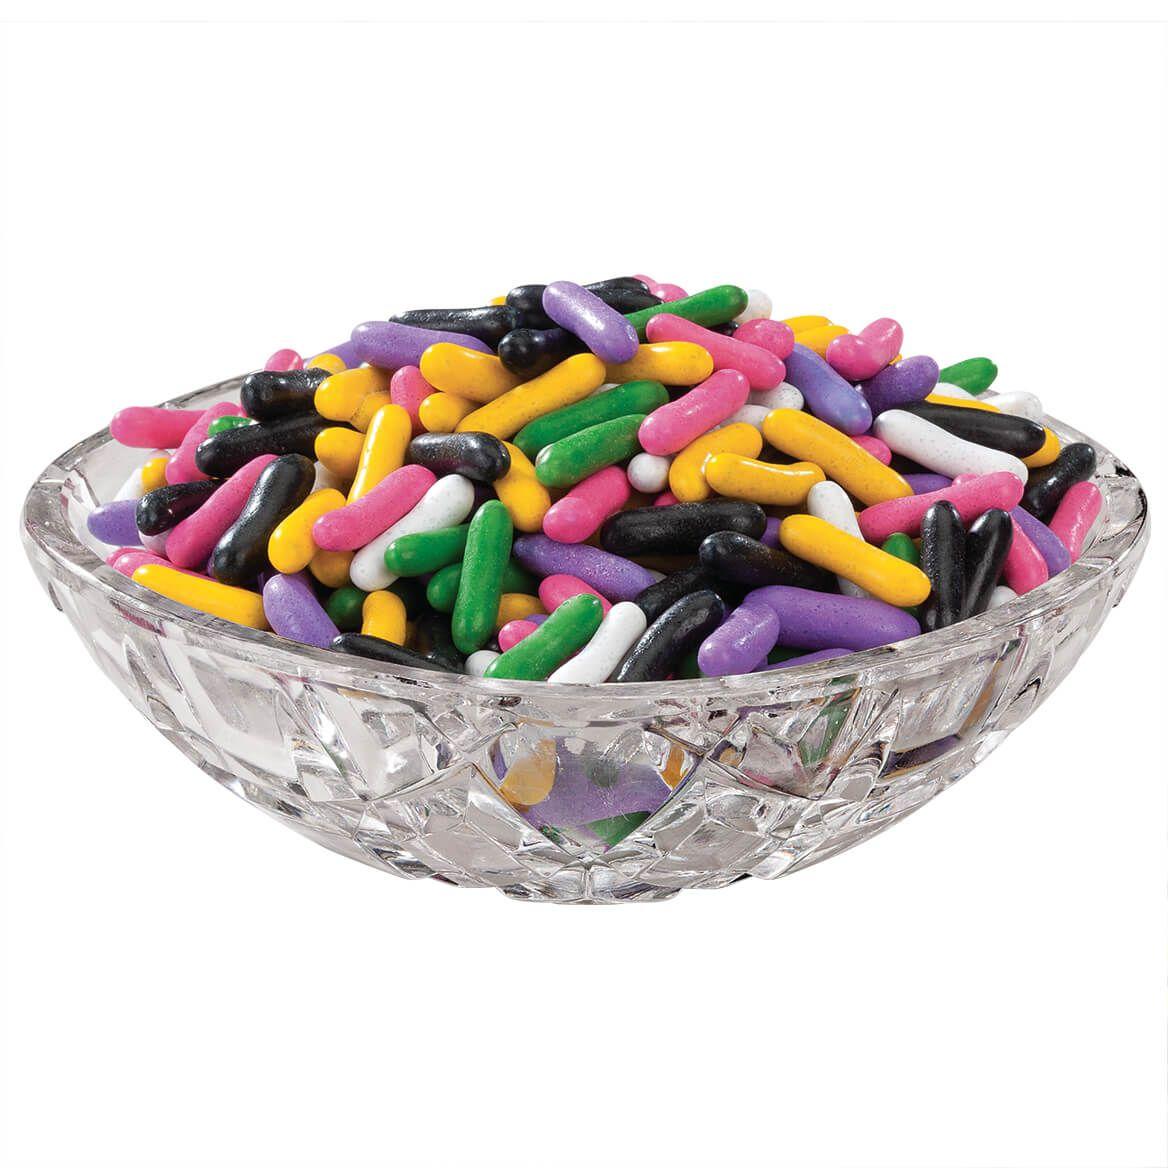 Licorice Pastels 13 oz.-353585